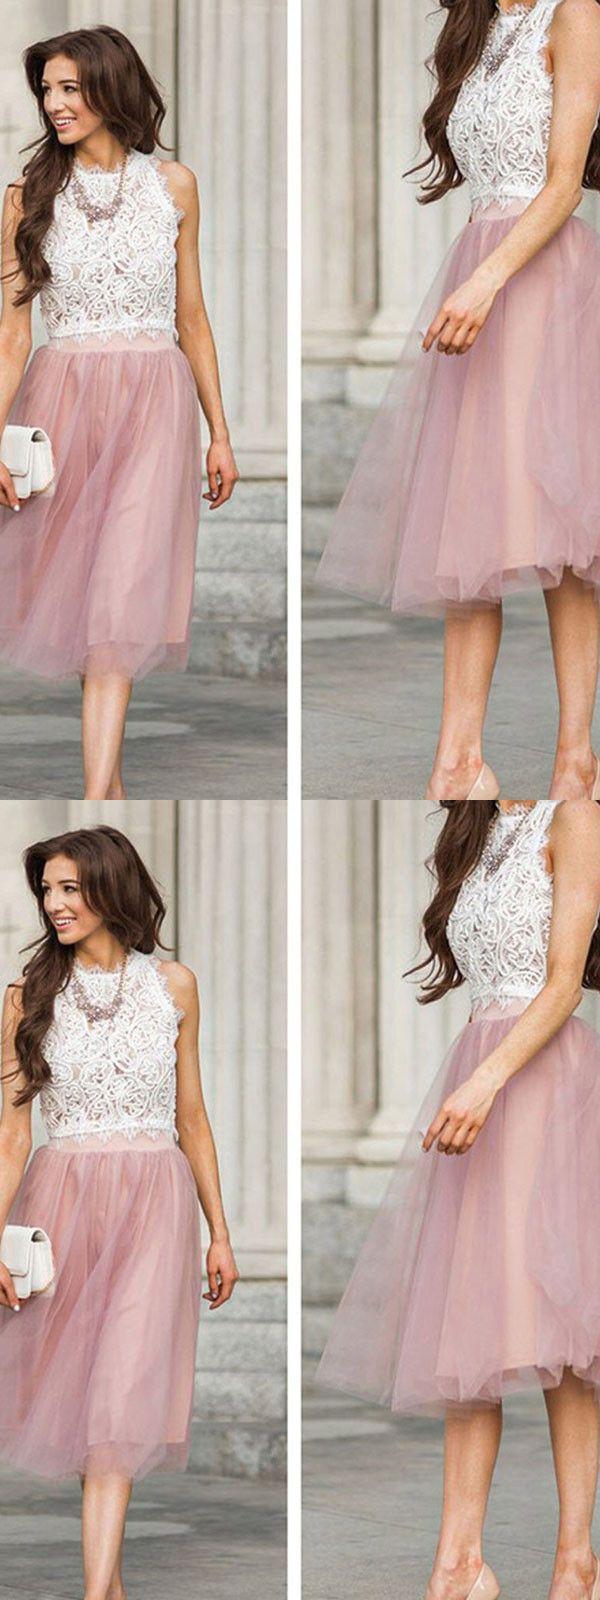 Aline scoop tealength sleeveless tulle homecoming dressshort